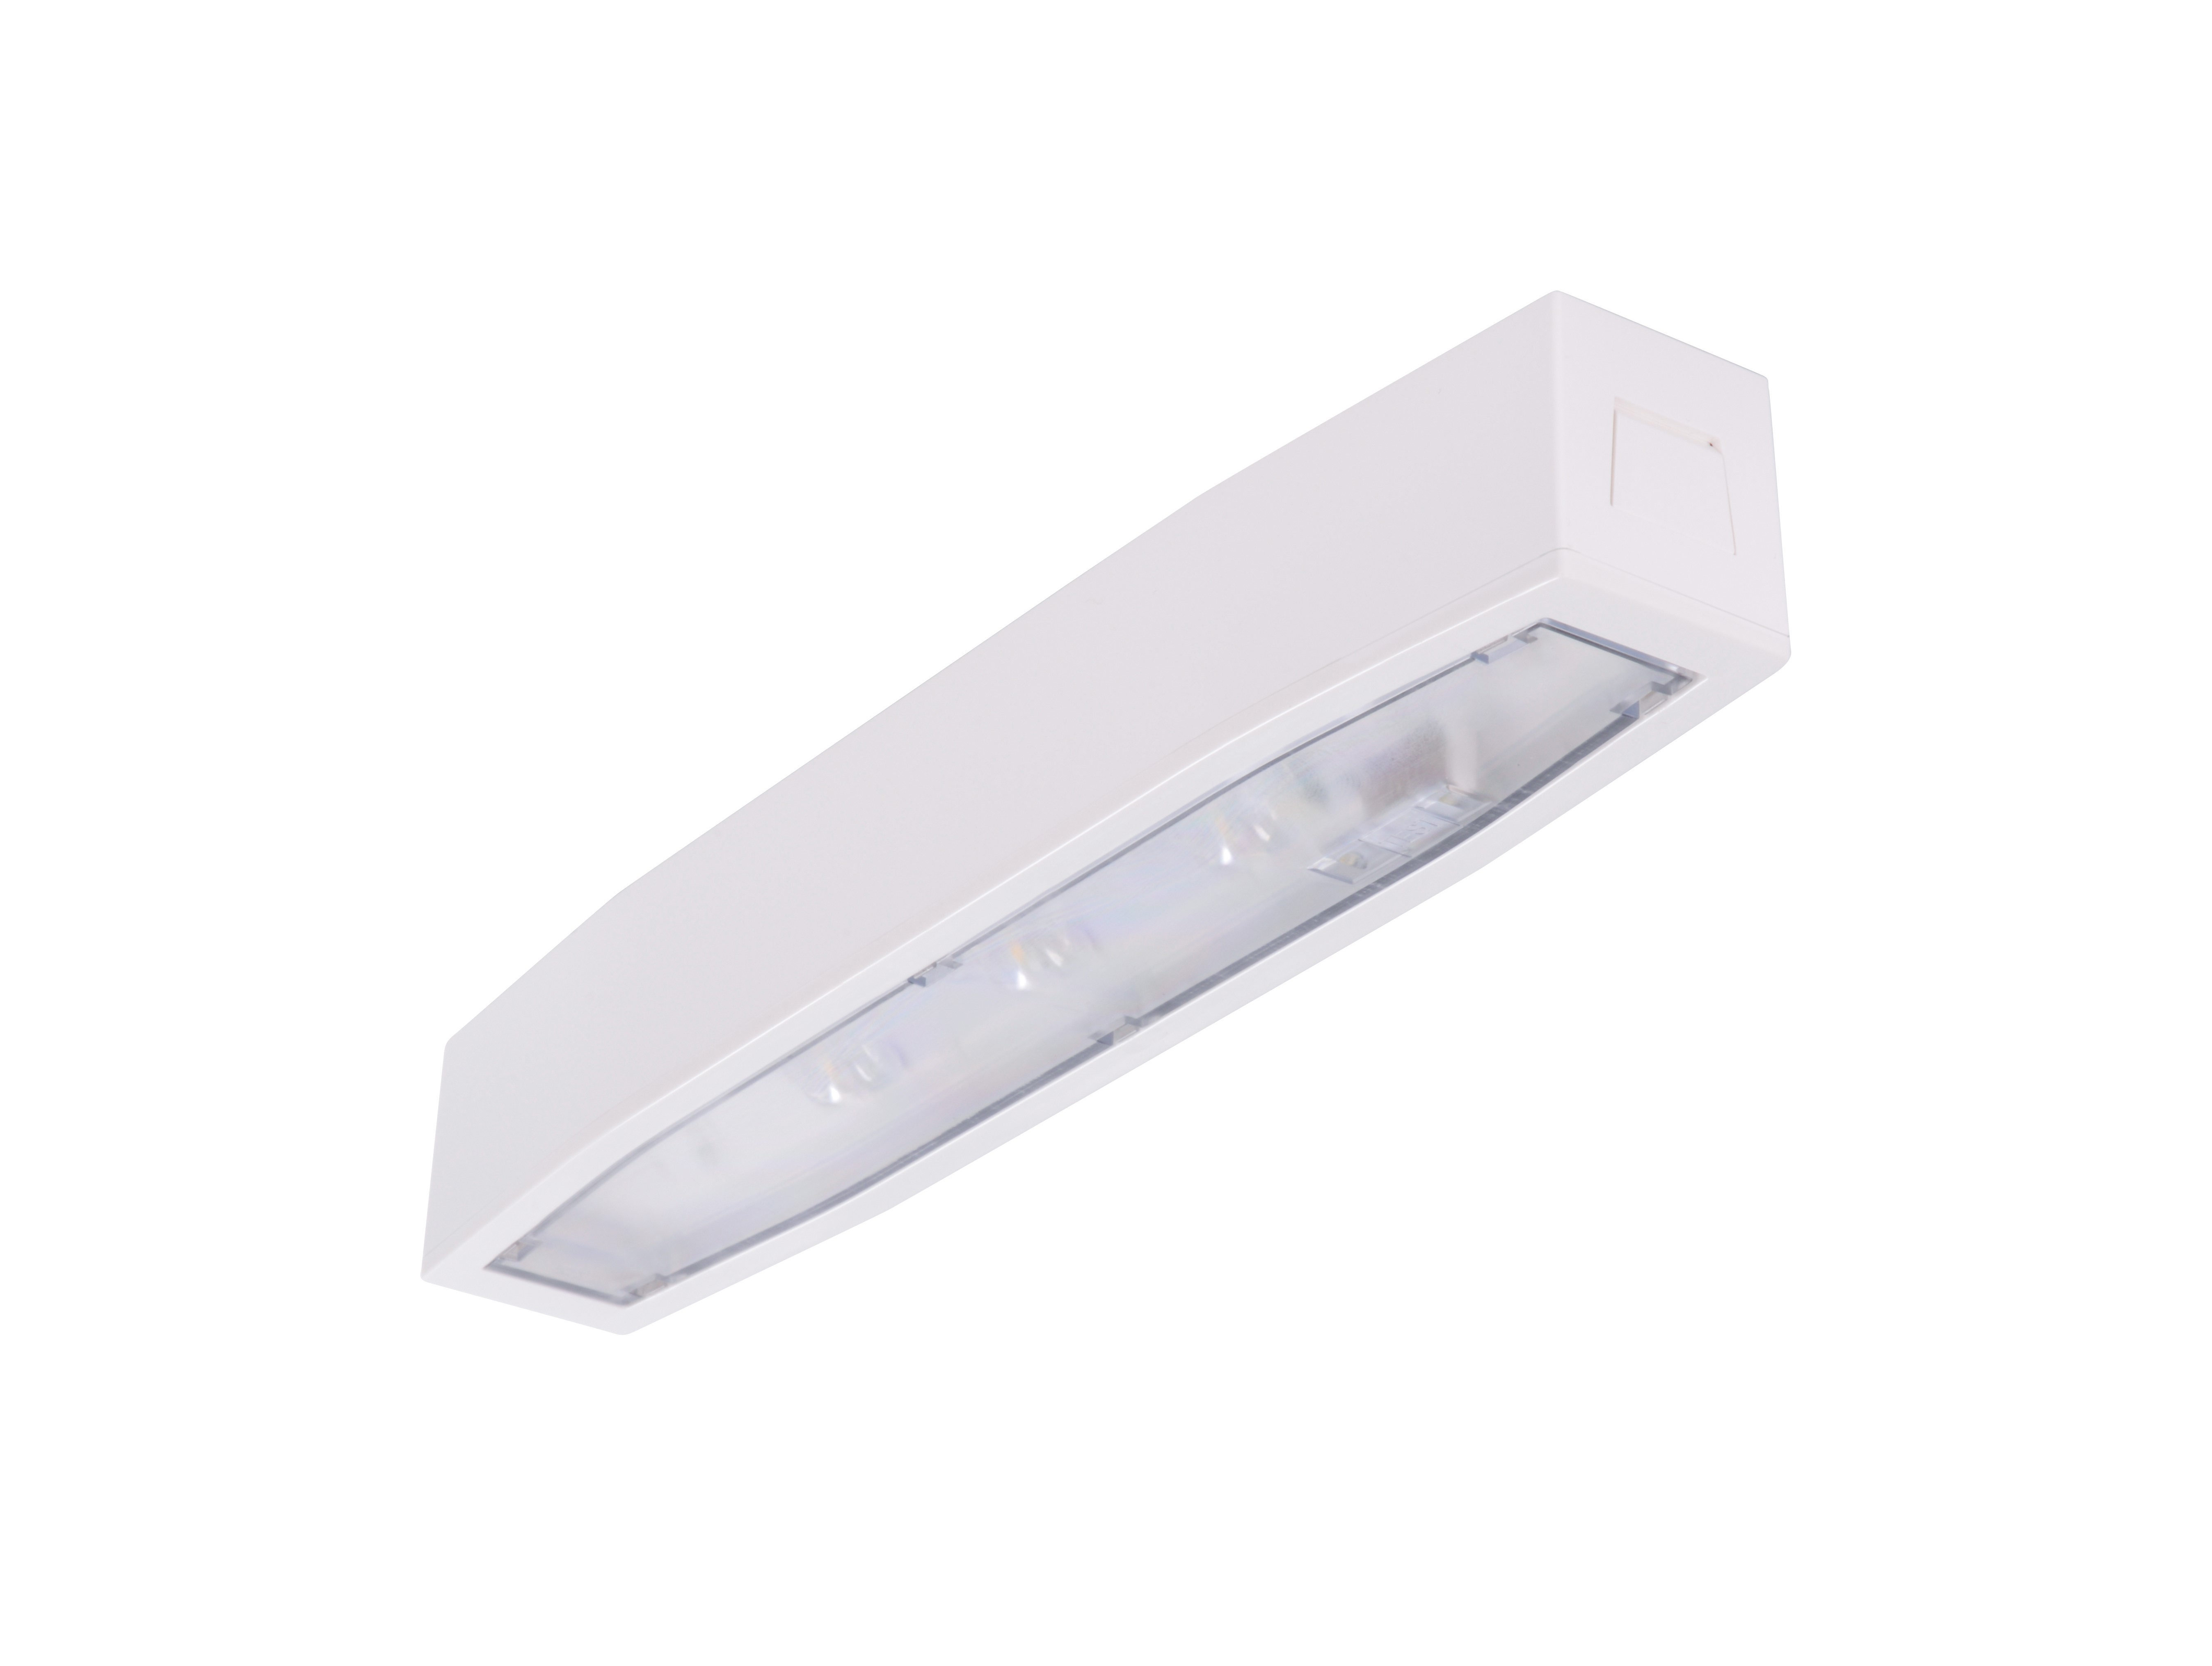 Lampa emergenta led Intelight 94517   3h mentinut test automat0